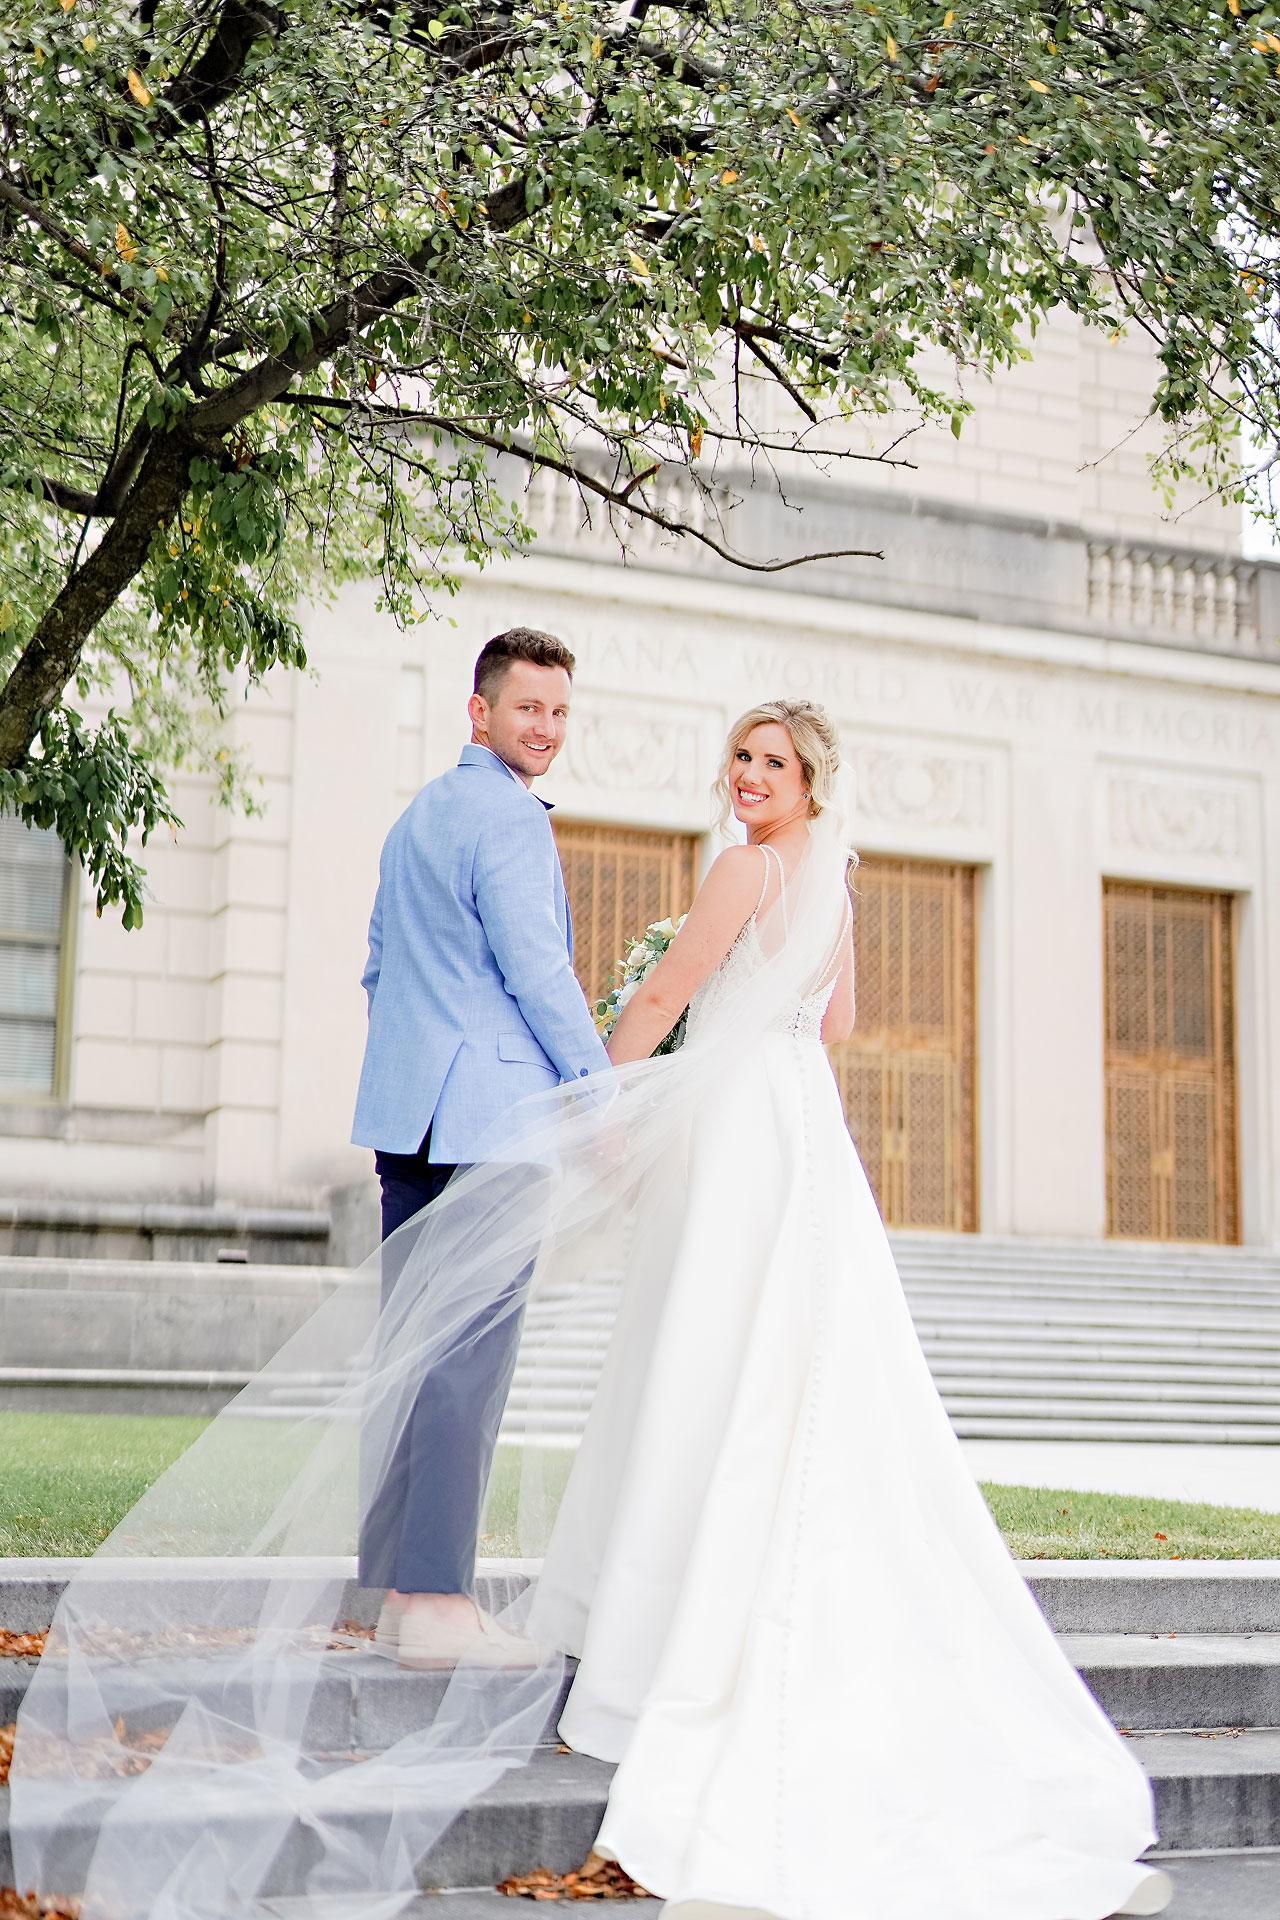 Sammi Jack Regions Tower JPS Events Indianapolis Wedding 064